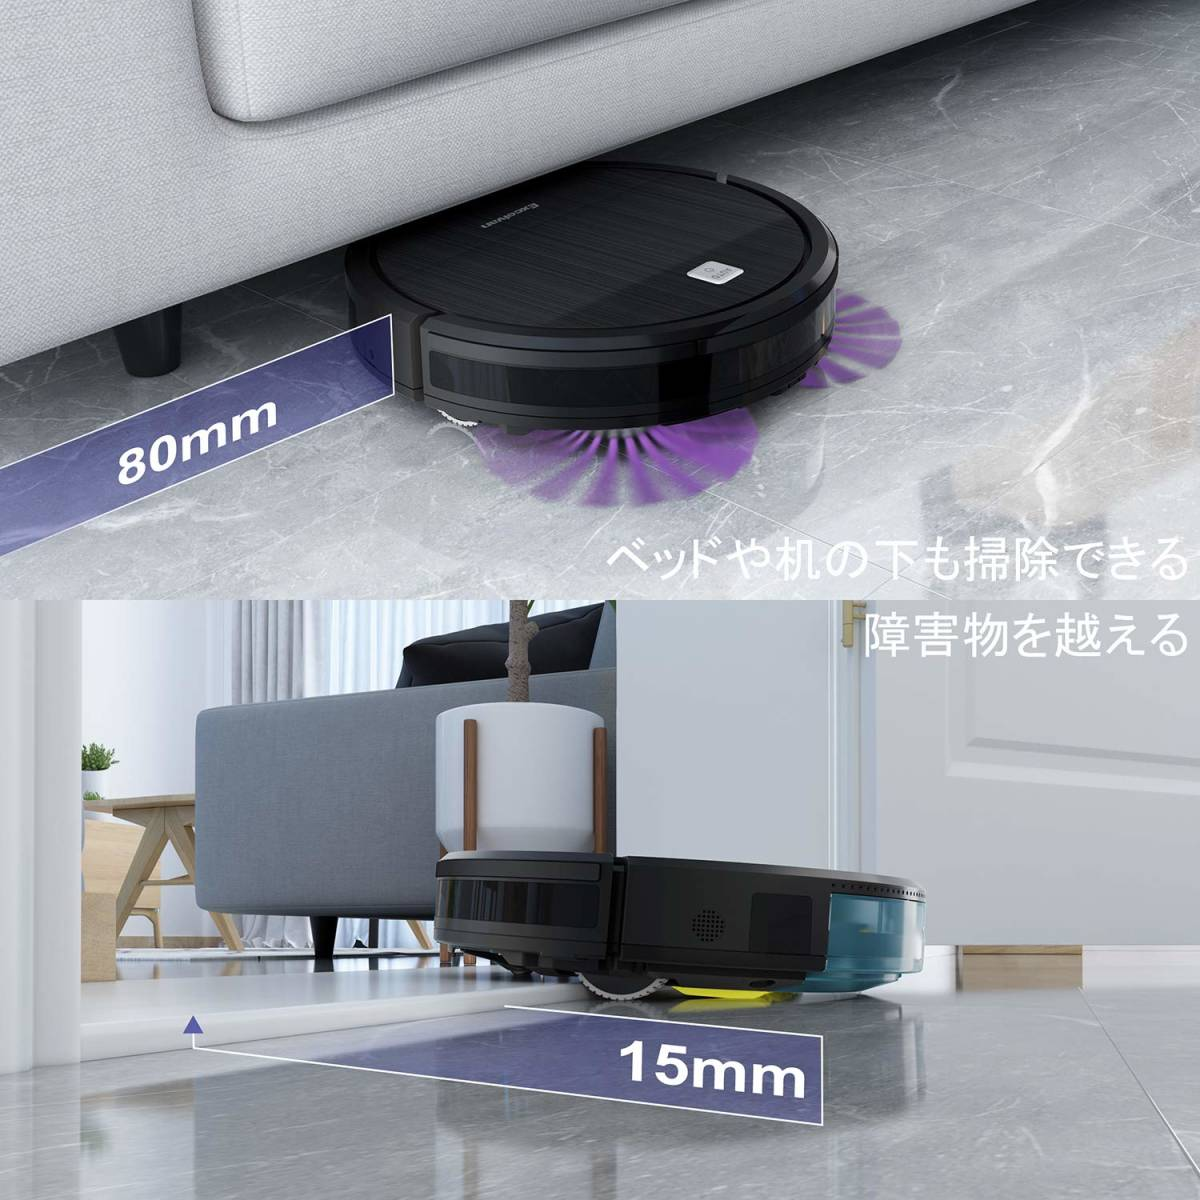 Excelvan D35 ロボット掃除機 スマートな計画式掃除 ロボット型クリーナー 4つの清掃モード 1600Paの強力吸引 120分長時間稼動 自動充電_画像9